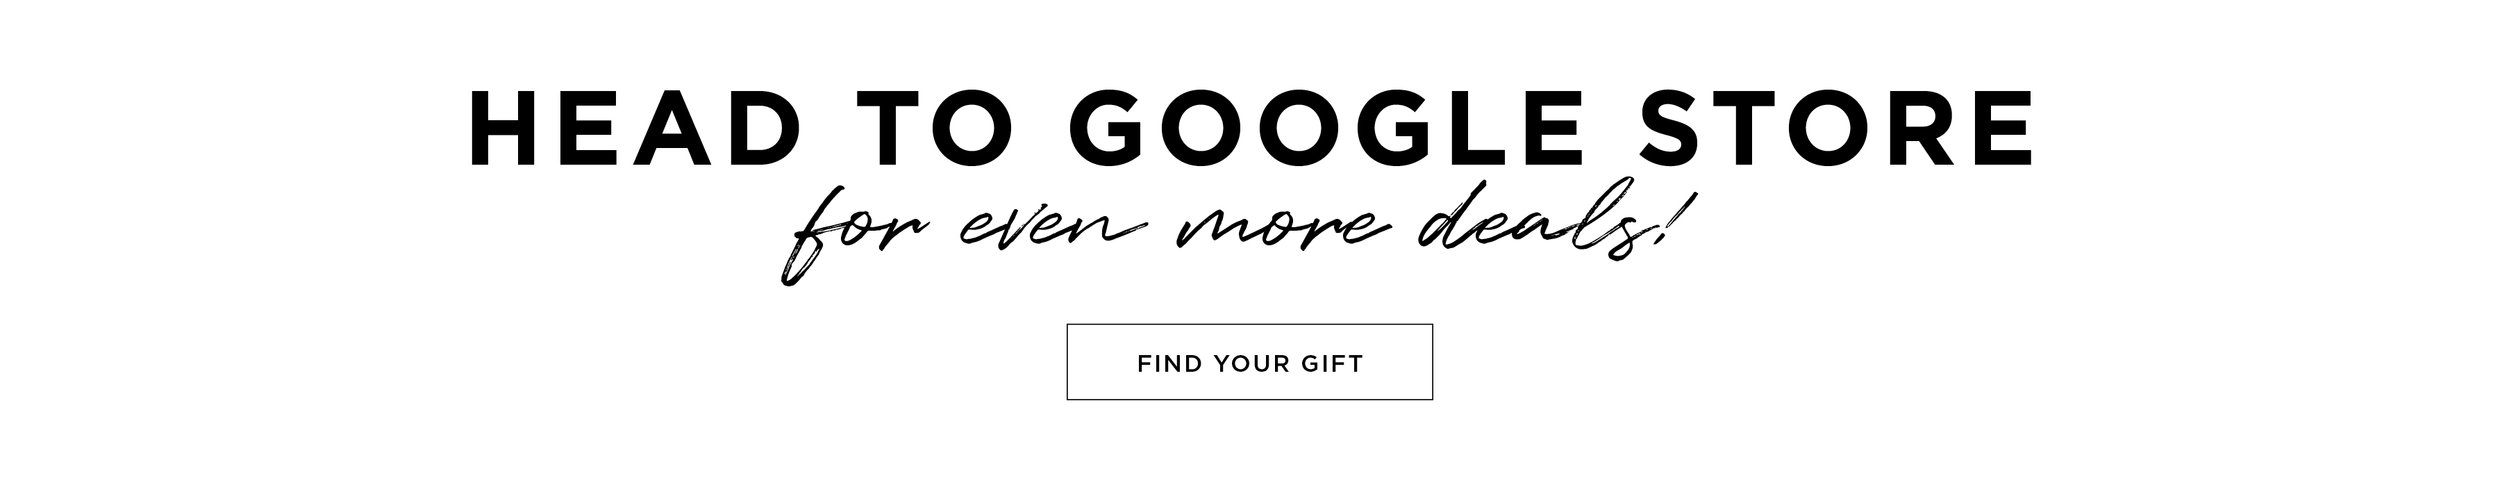 head-to-google-store.jpg